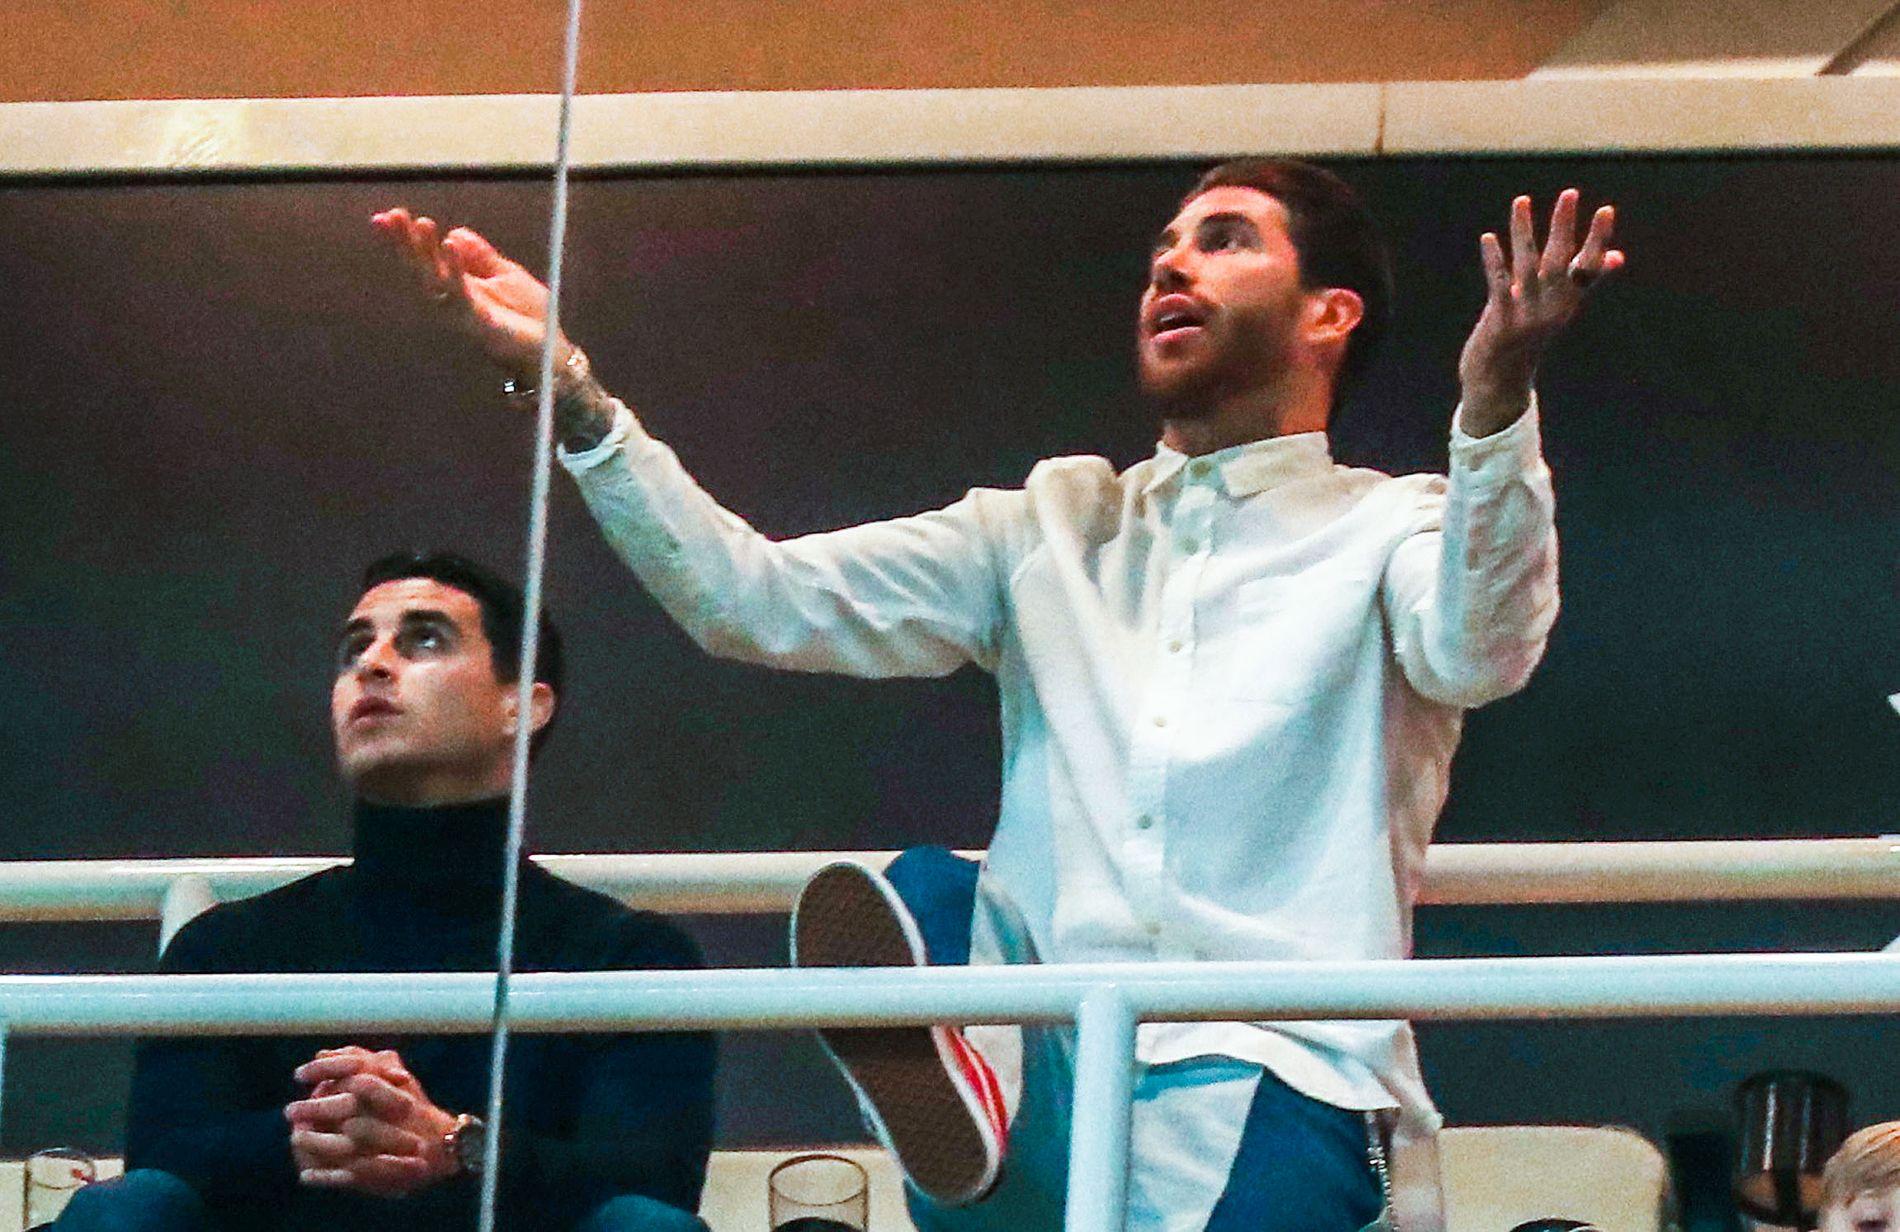 EL CAPITAN: Sergio Ramos satt på tribunen, han, fordi han tok et gult kort med vilje i bortekampen, da han trodde avansementet var i boks.